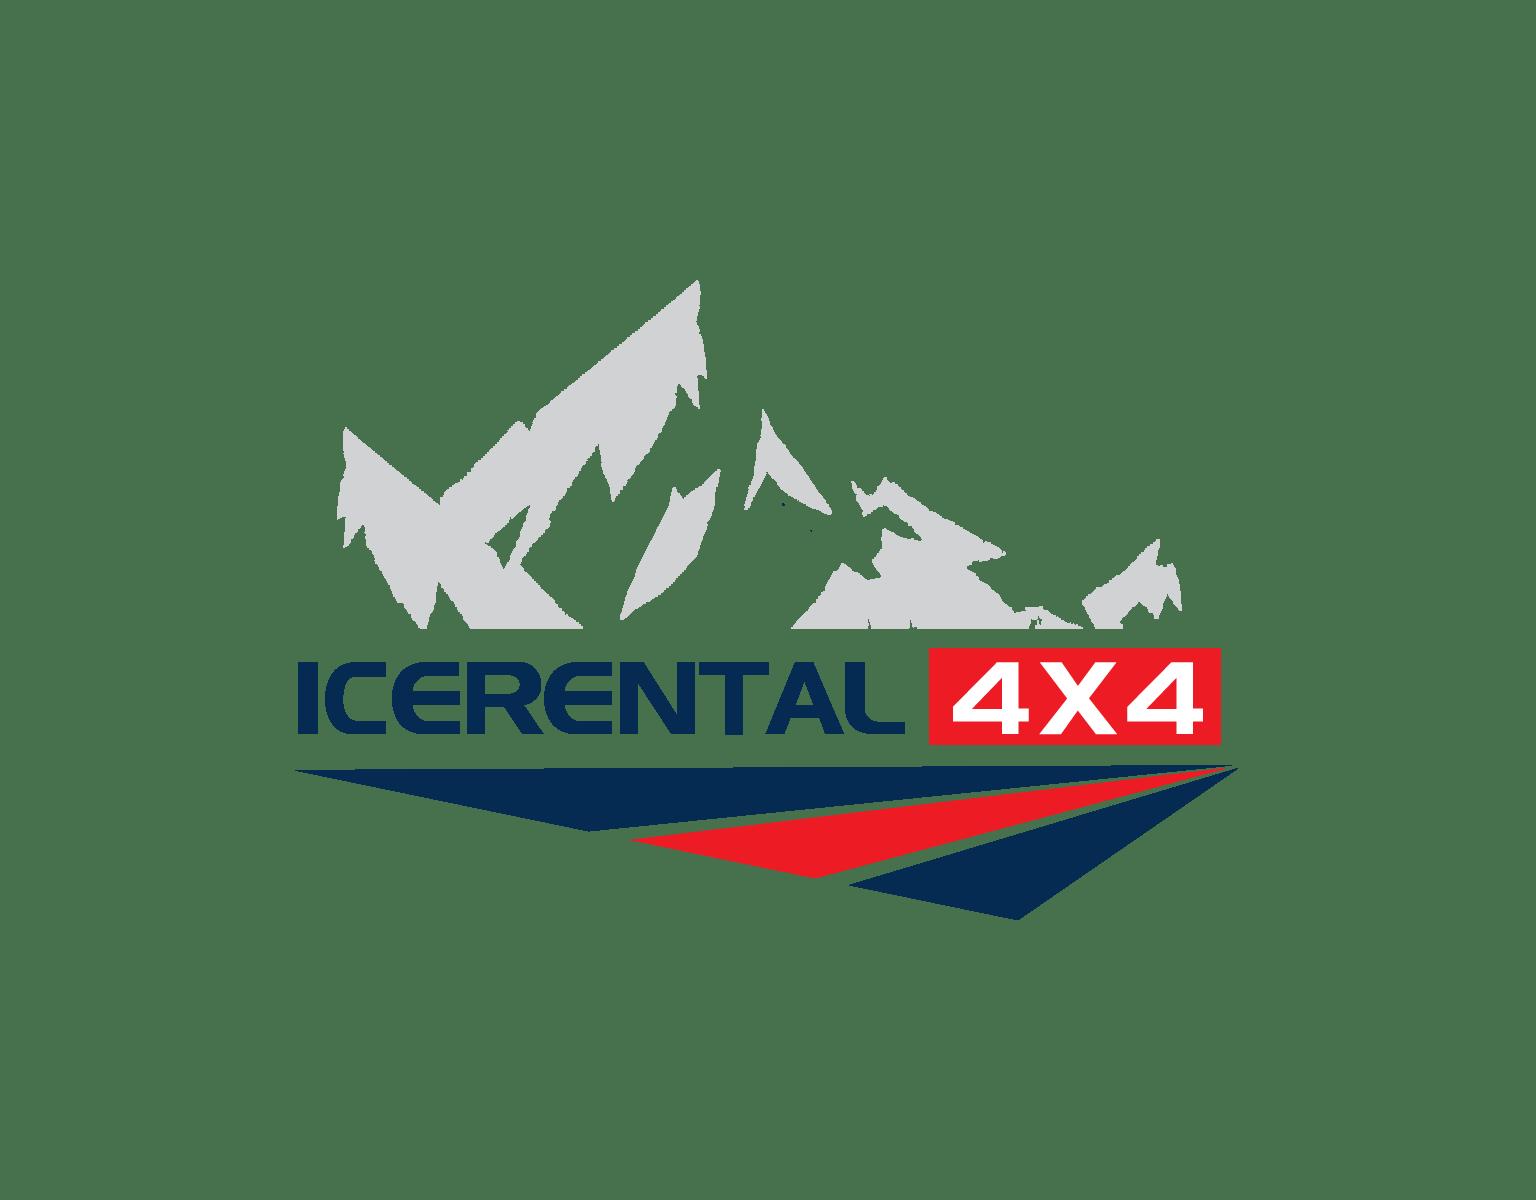 Icerental 4x4